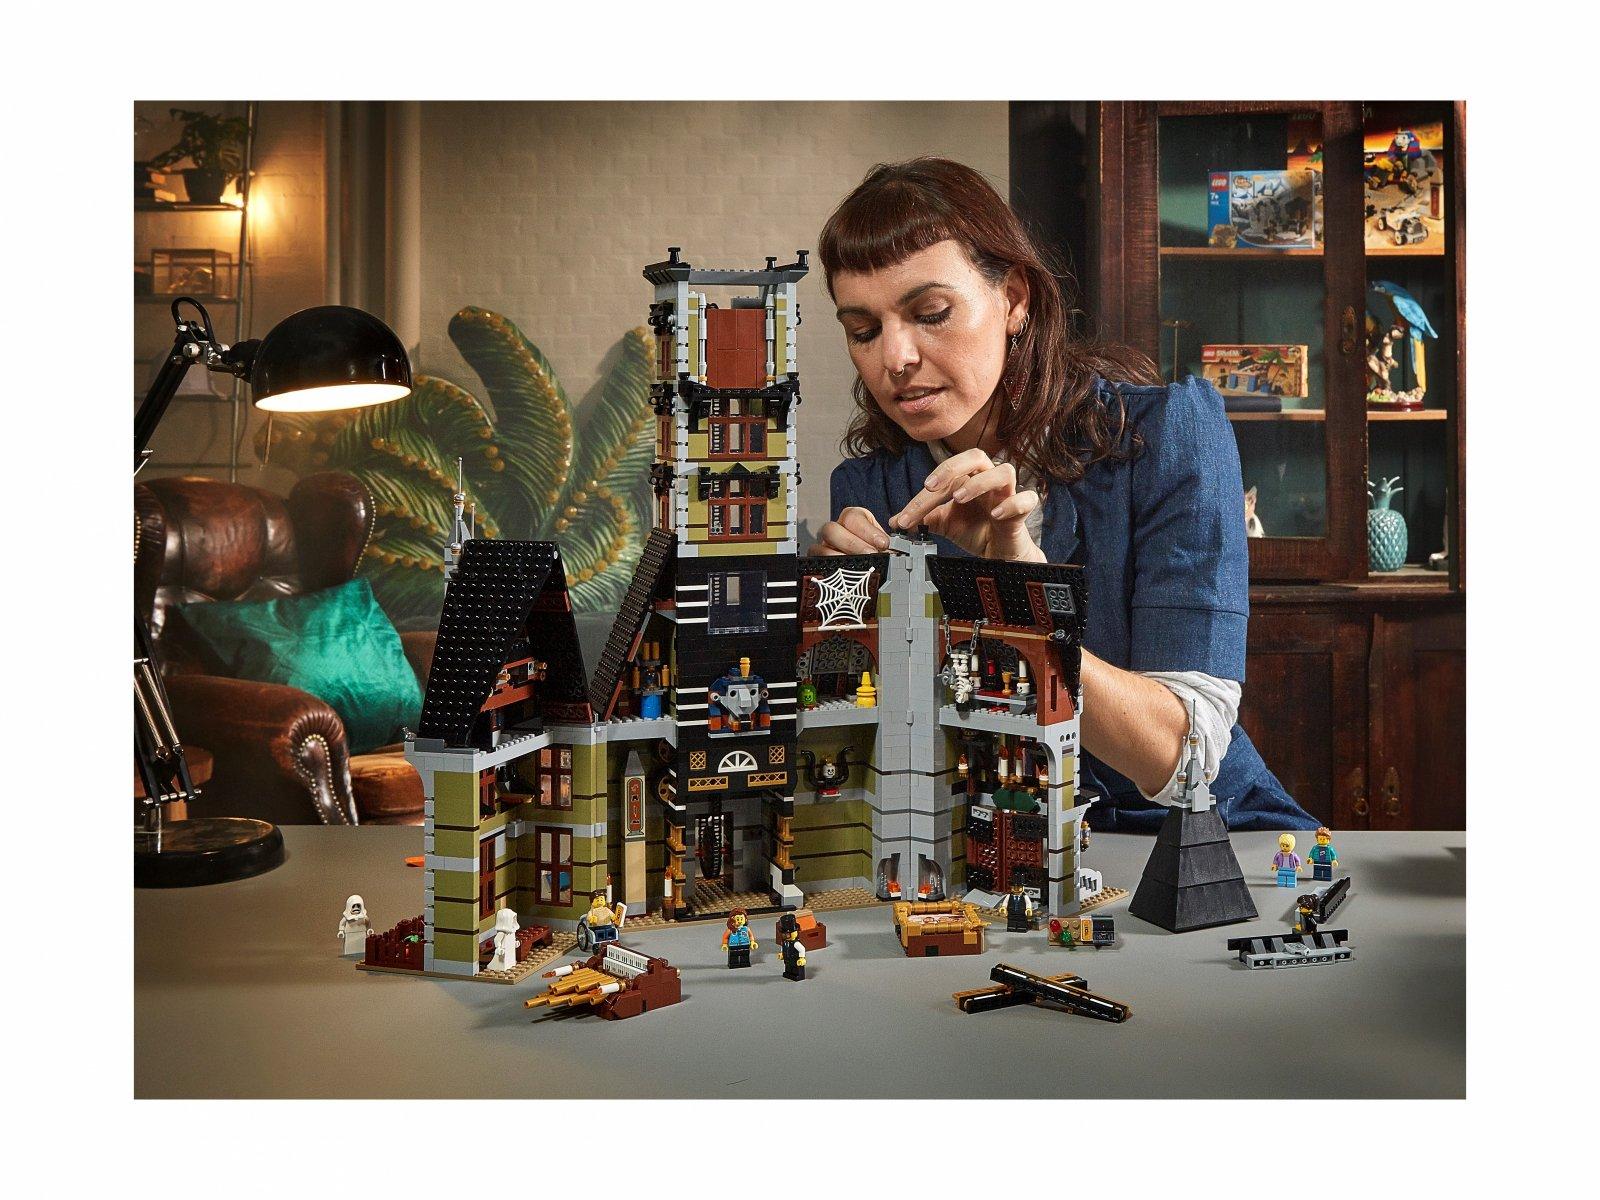 LEGO 10273 Dom strachu